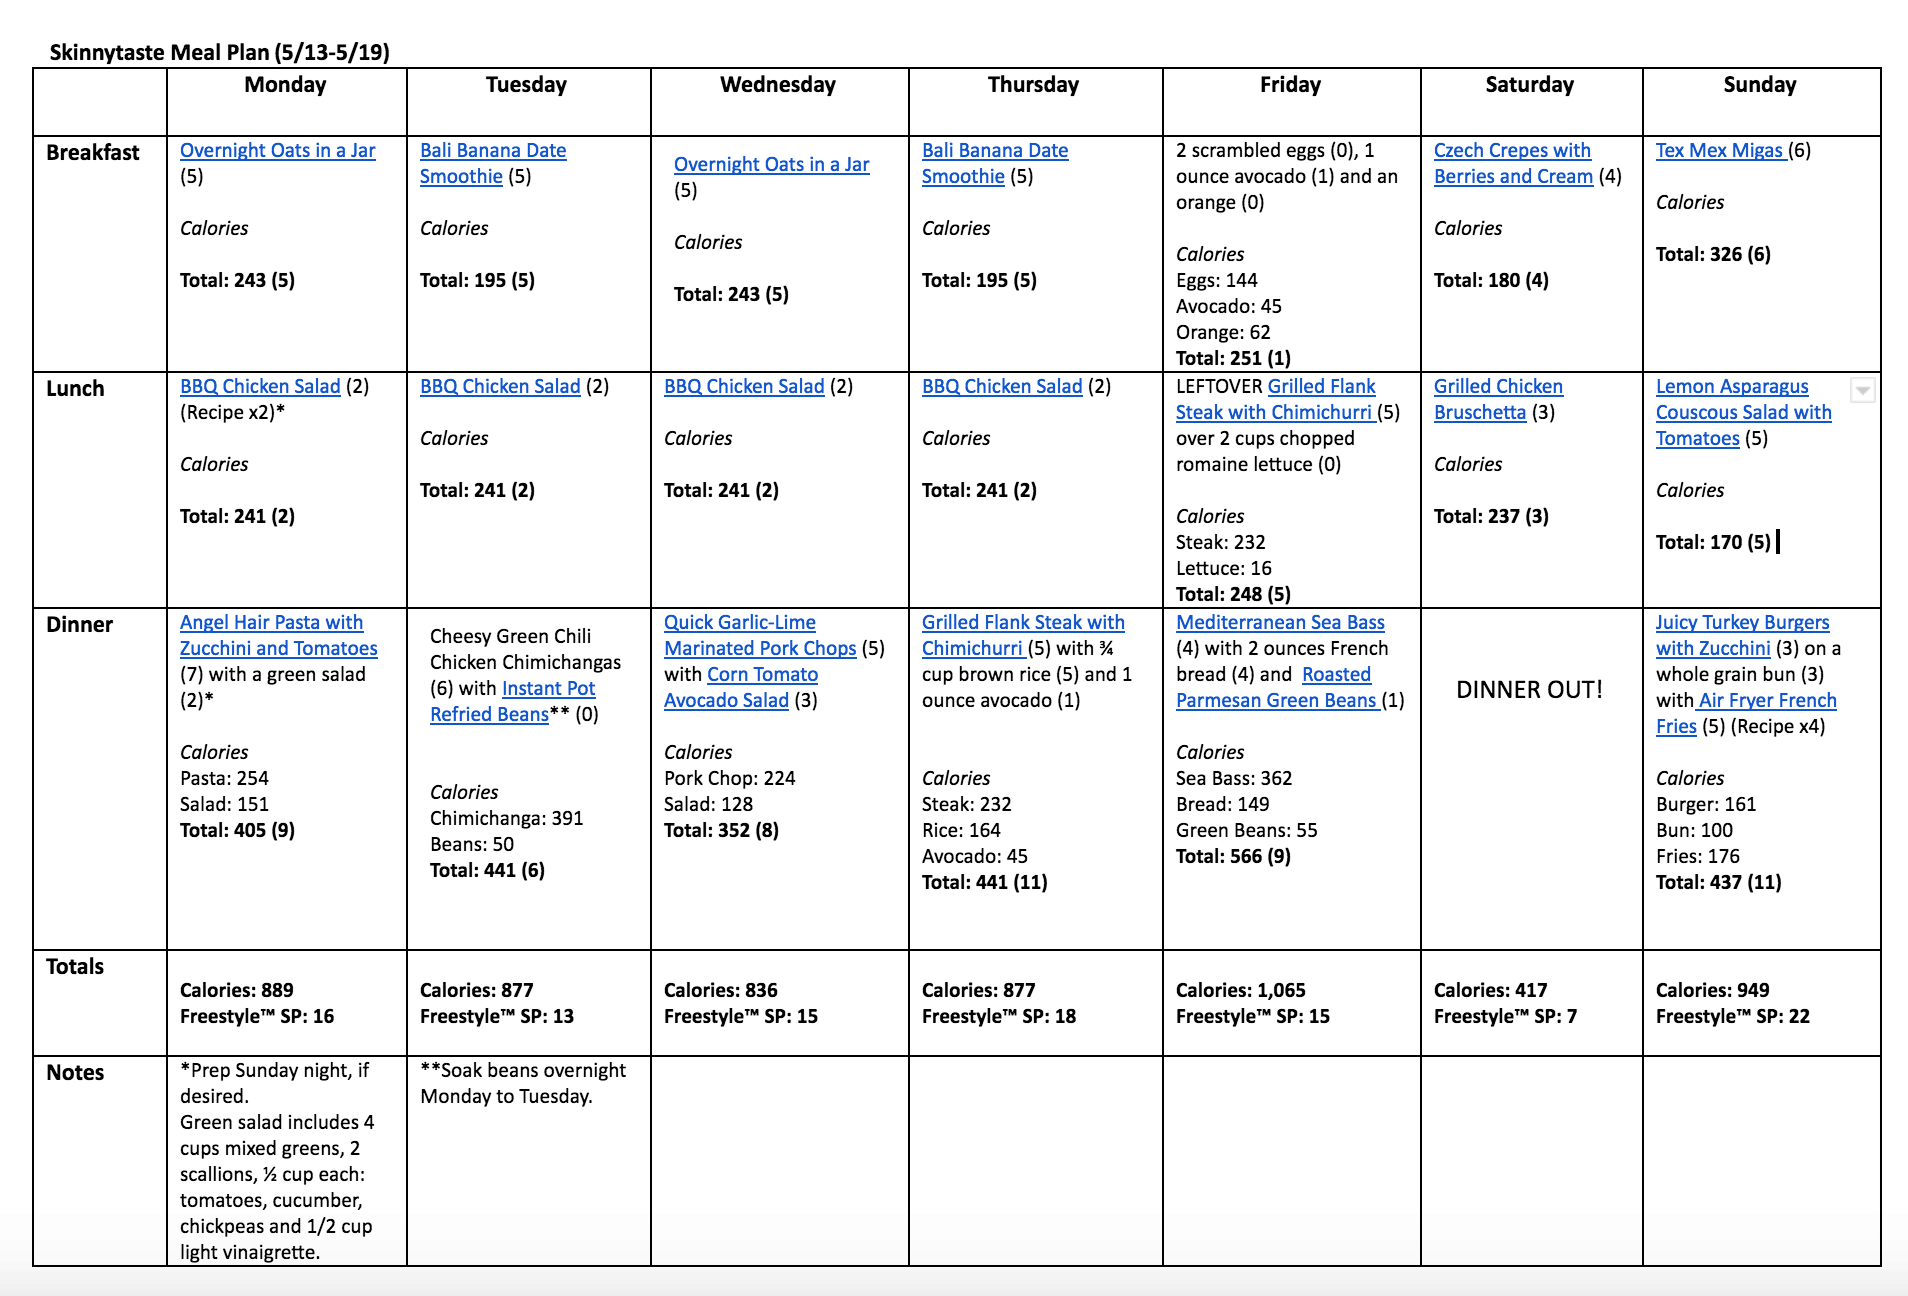 Skinnytaste Meal Plan (May 13-May 19)